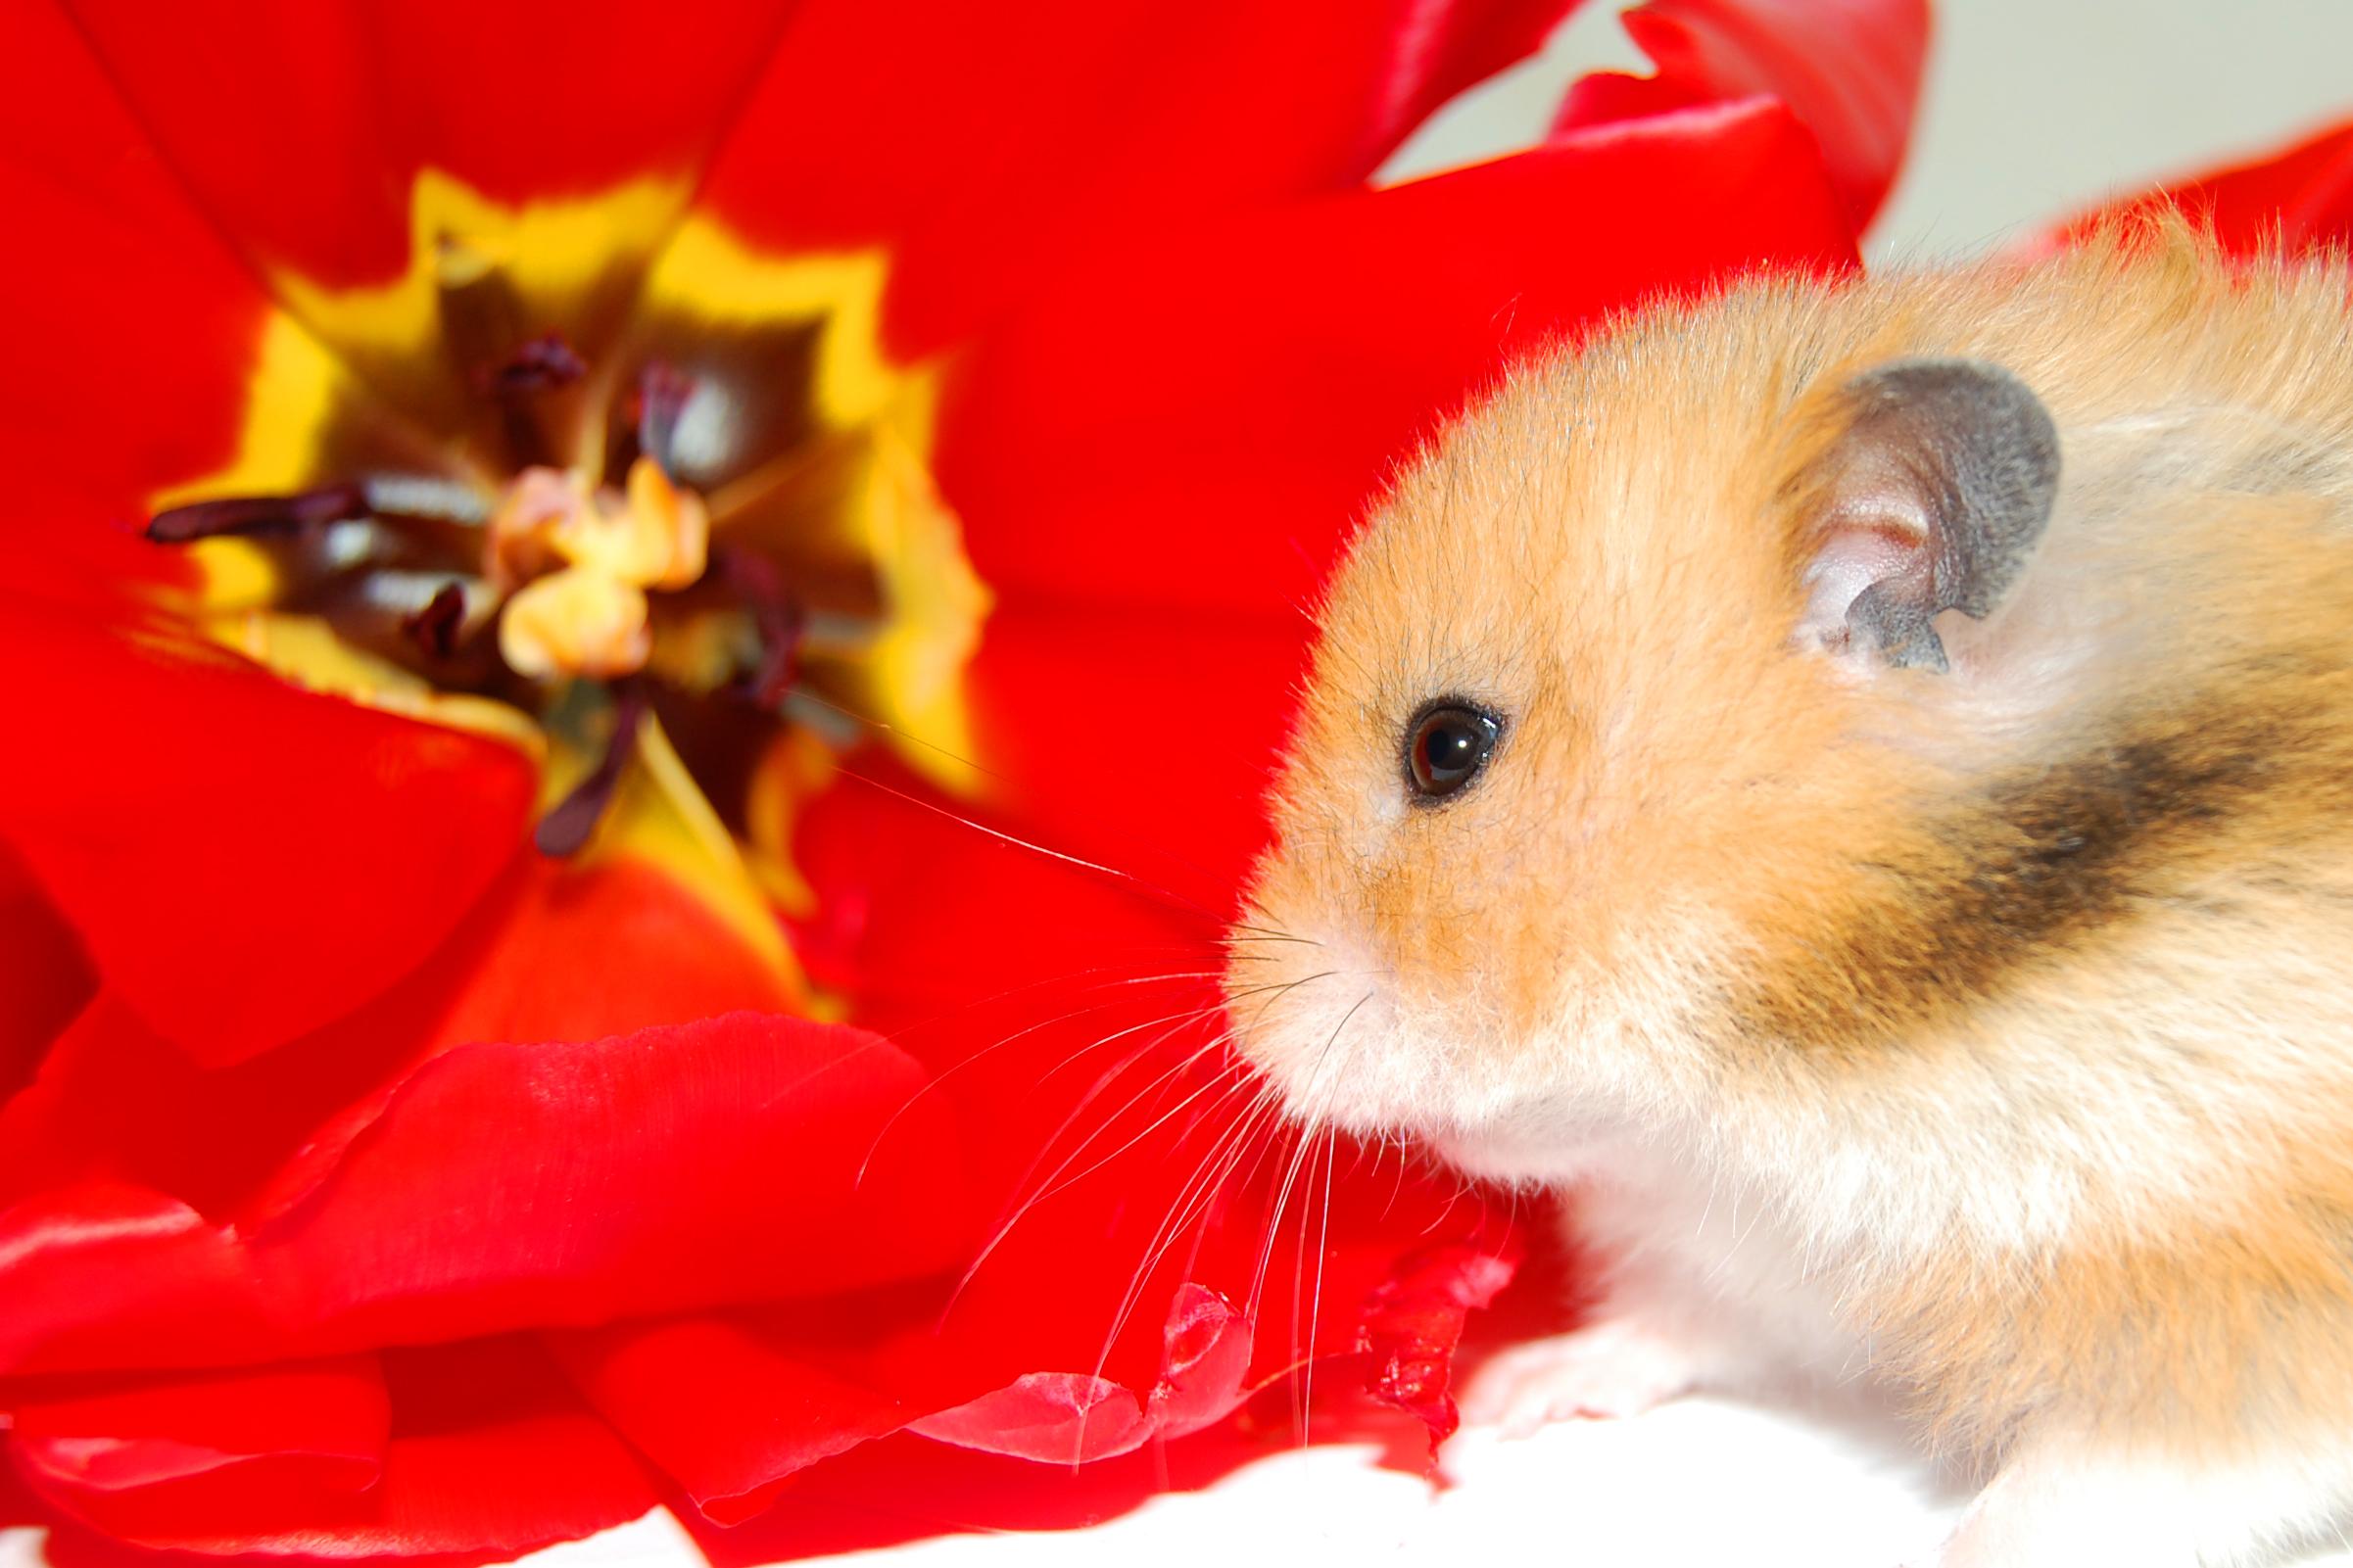 Kostenlose foto : Hamster, März, Frühling, Blumen, rot, Sitzung ...